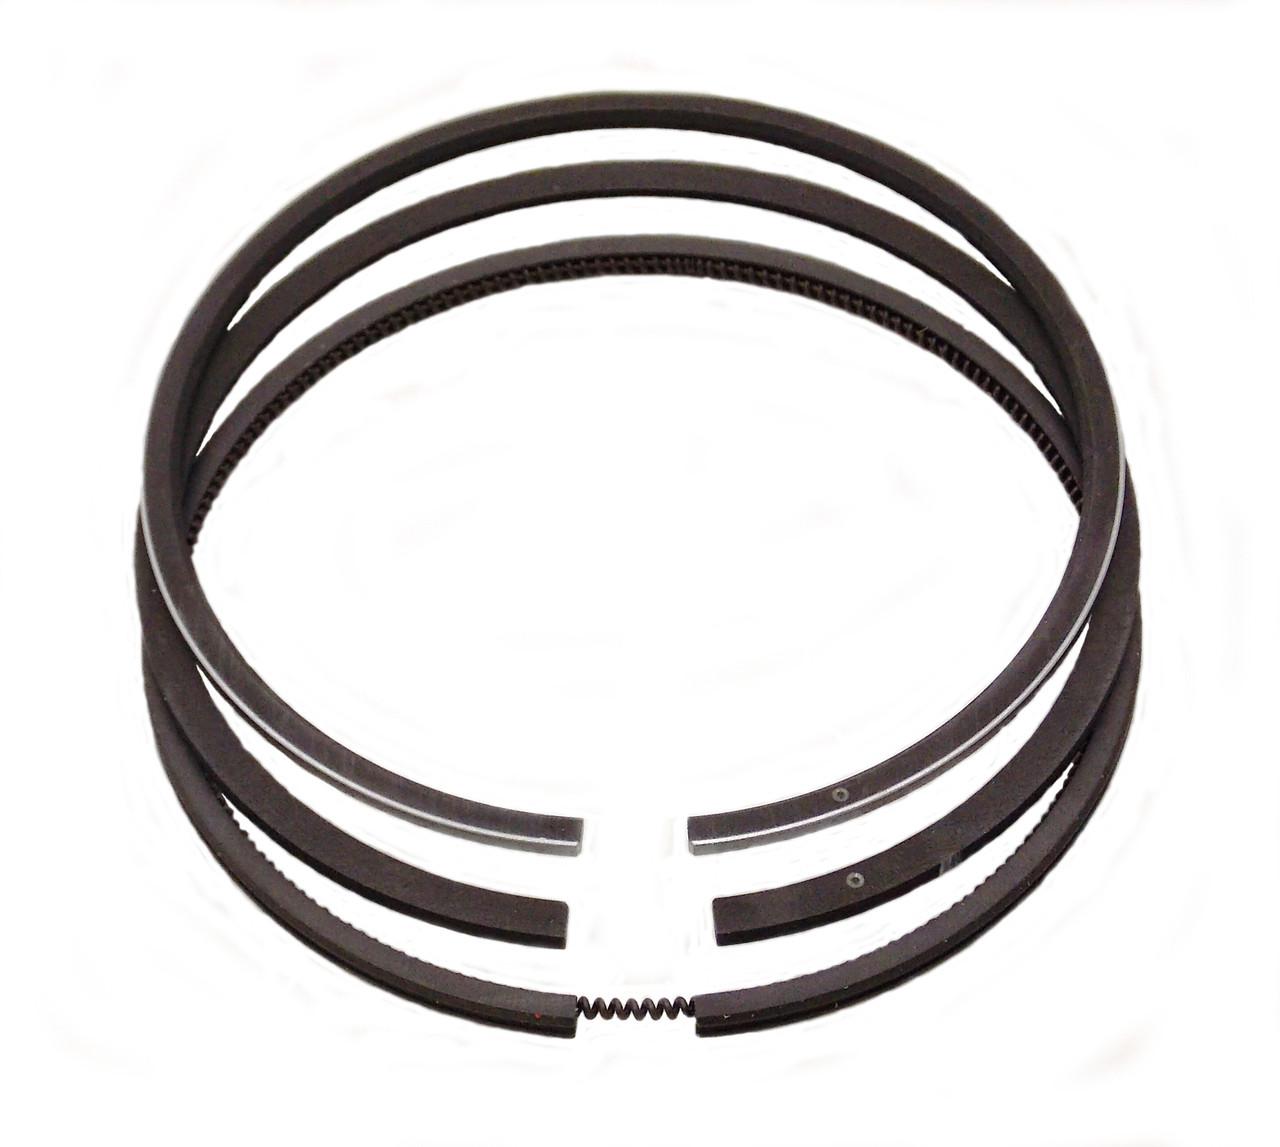 2815XC 2.815 Wiseco Ring Set